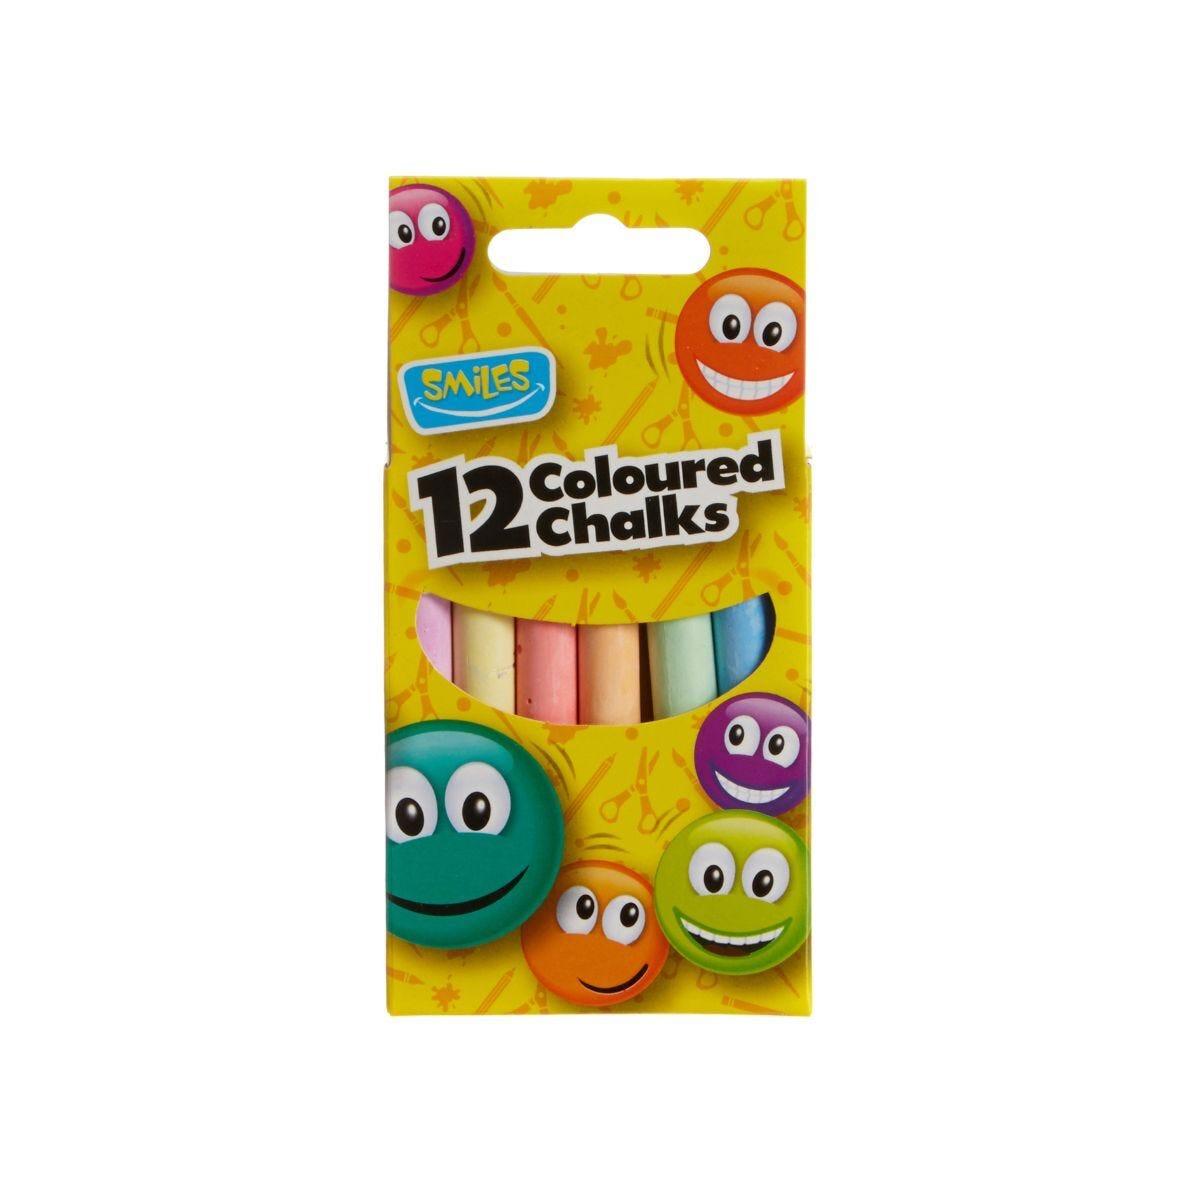 Smiles Coloured Chalks Pack of 12